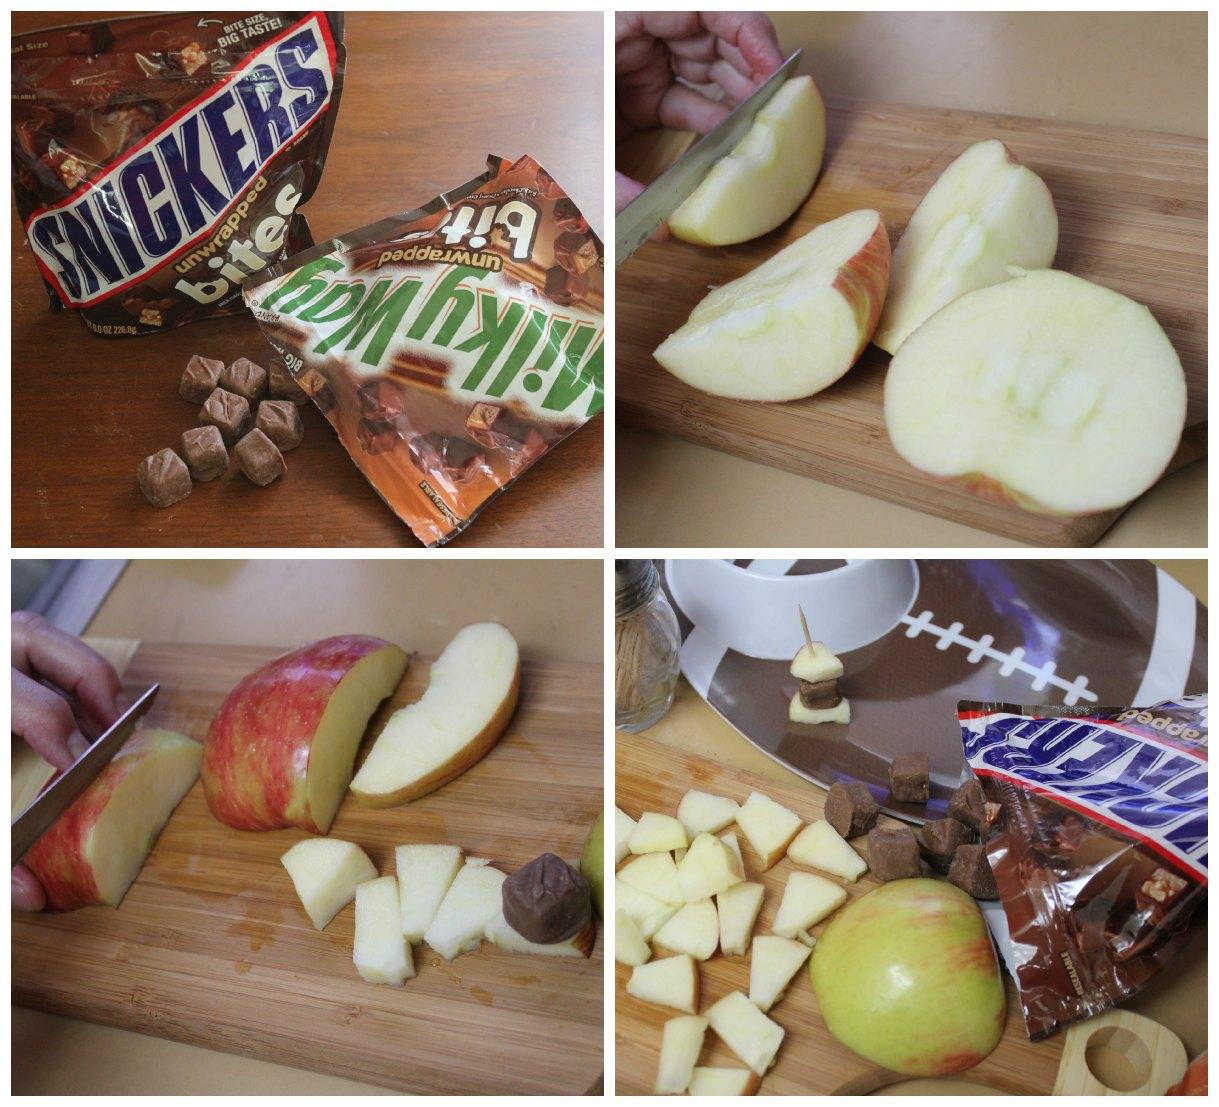 Snickers Bites Dessert